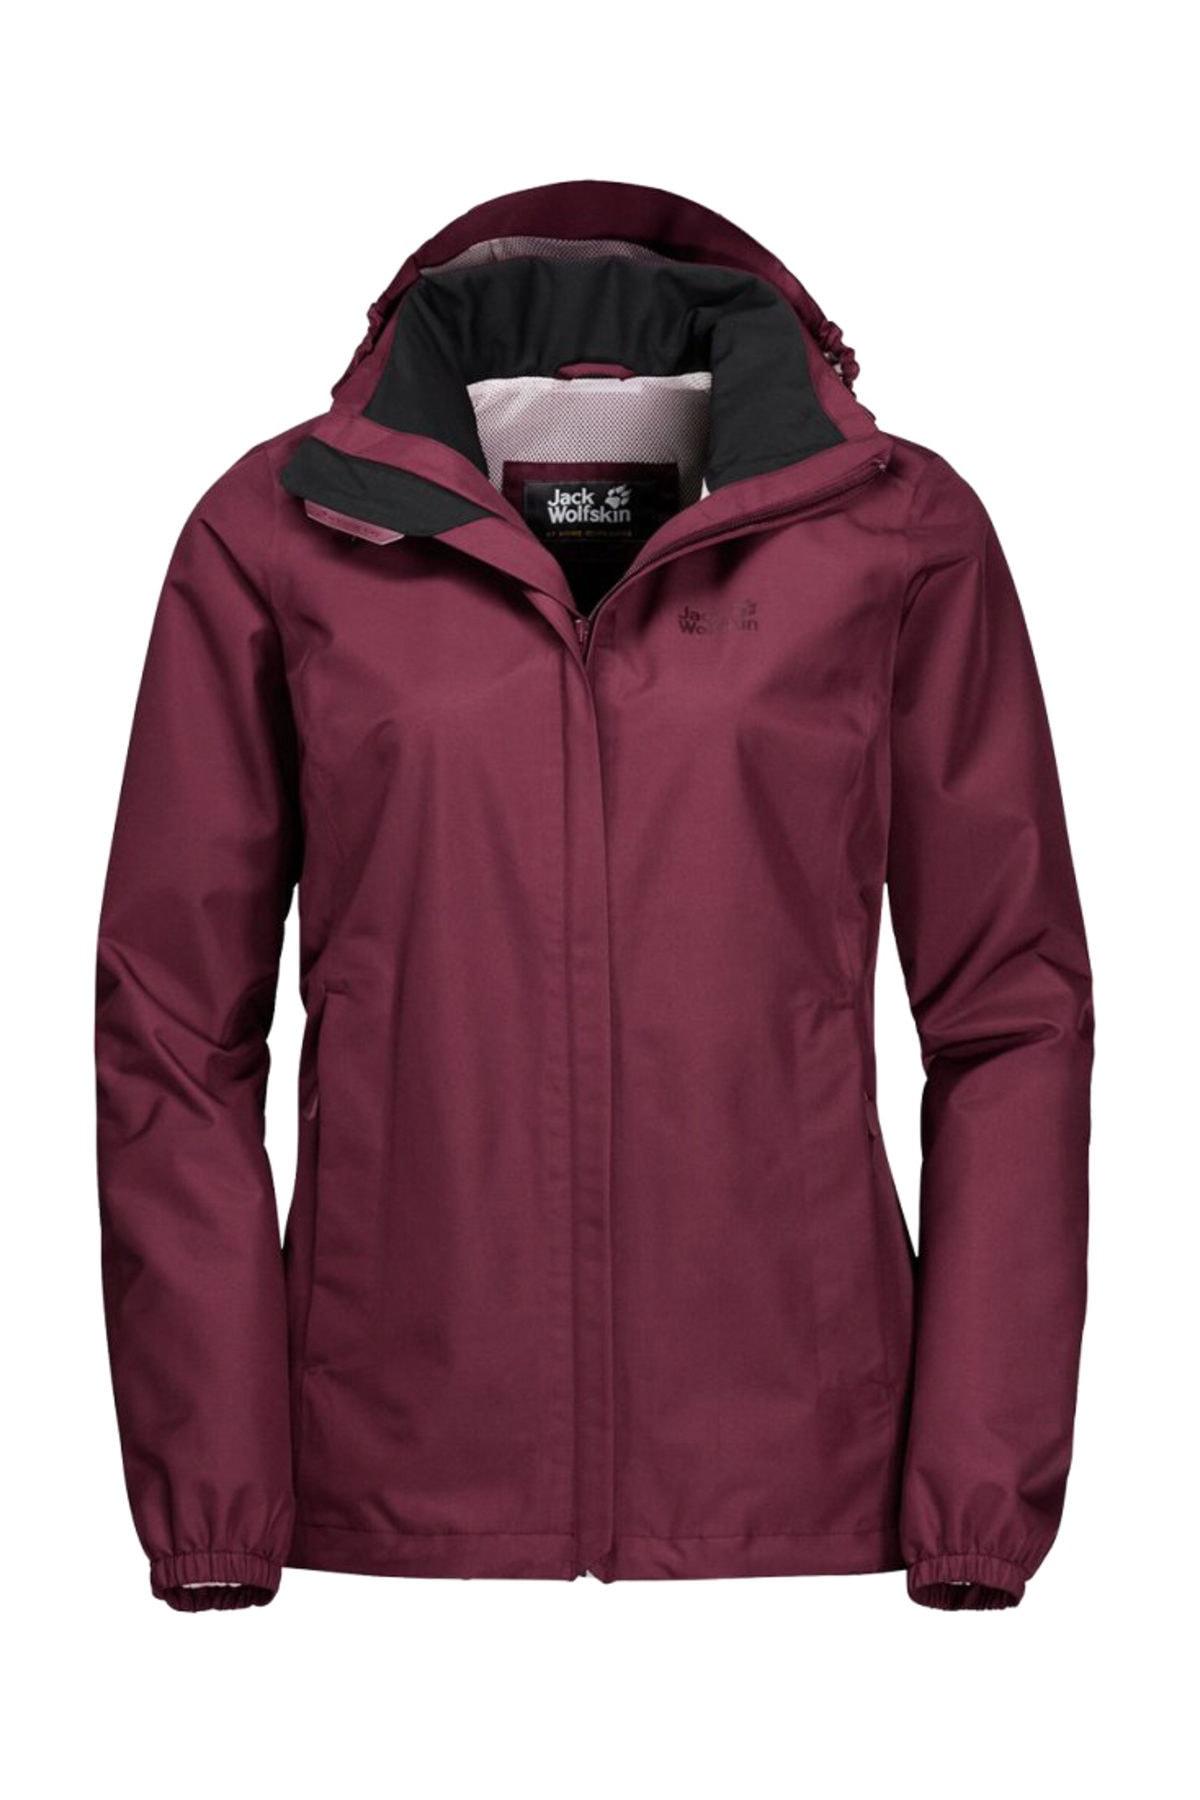 Jack Wolfskin Stormy Point Jacket Kadın Ceket - 1111201-2740 1